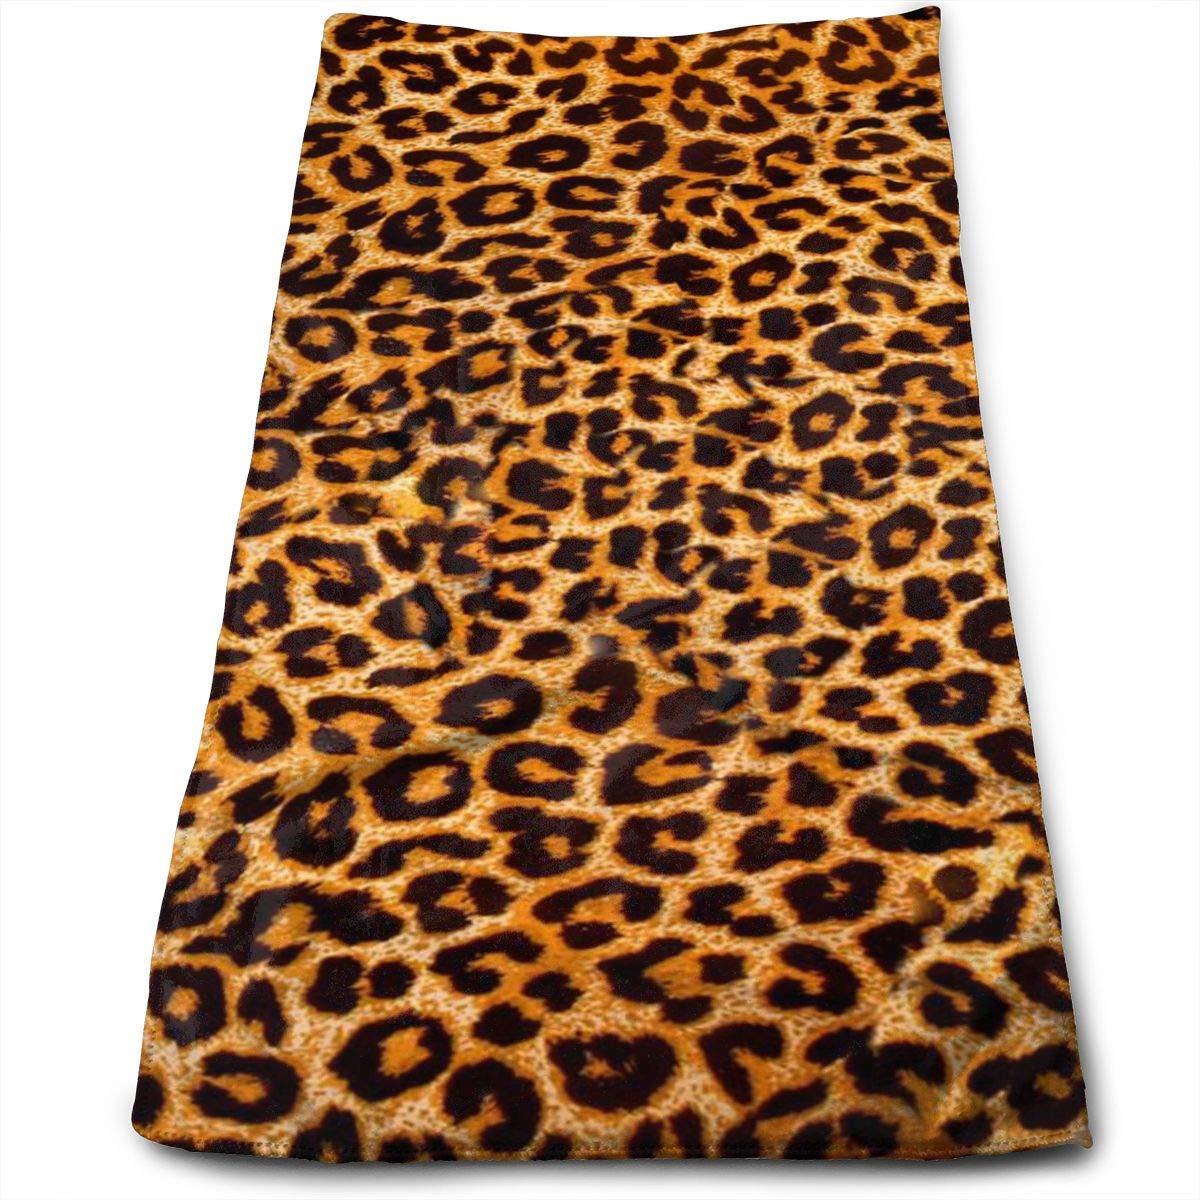 Leopard Print.jpg Design Massiness Beach Towel, Quick Dry Towel for Swimmers, Sand Free Towel, Pool Towel, Bath Towel